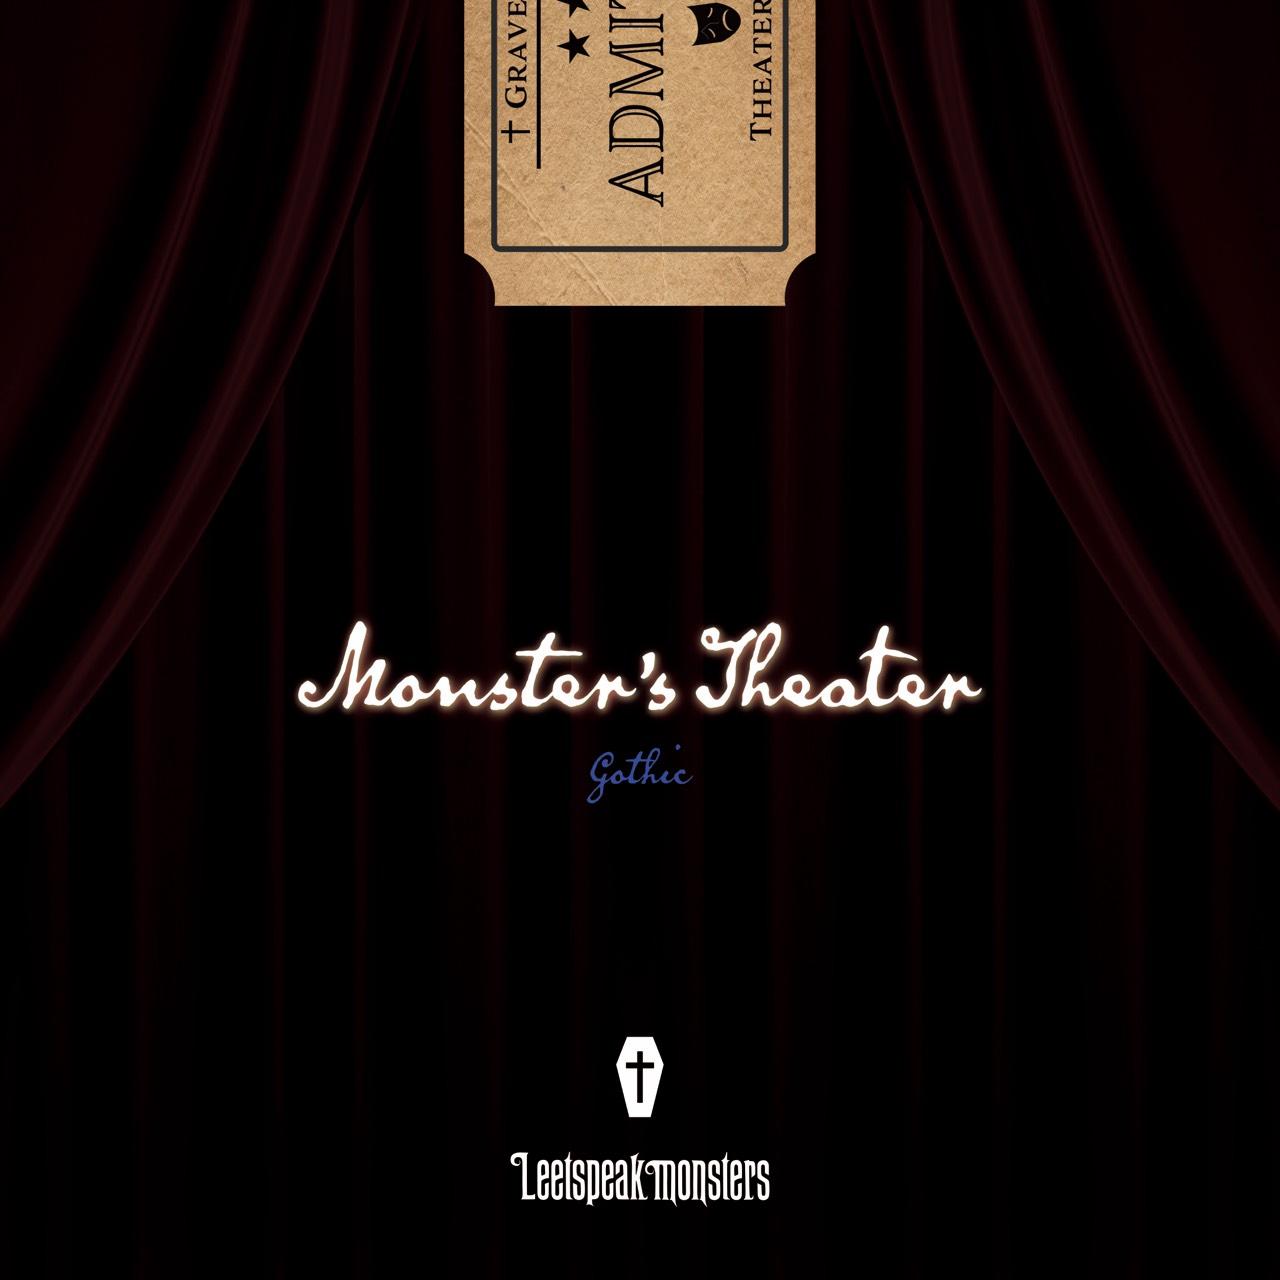 Monster's Theater